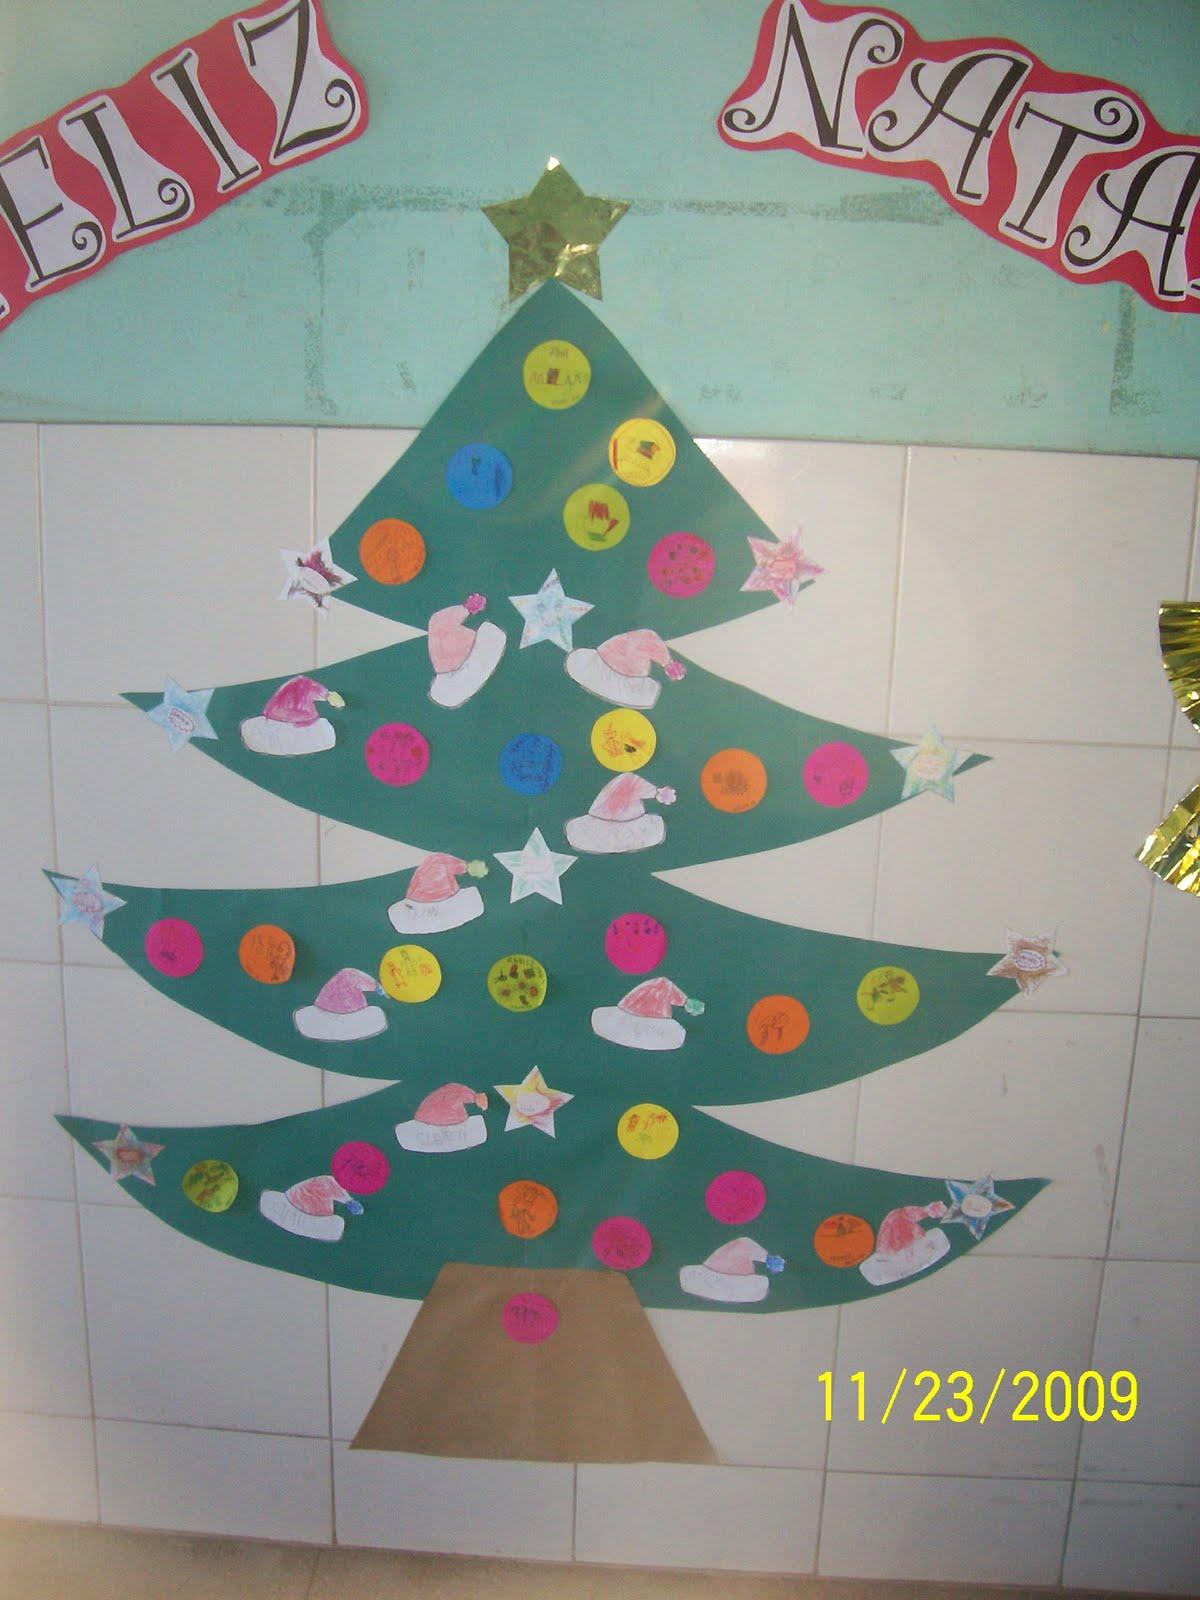 Cantinho descobertas diarias mural para o natal for Mural de natal 4 ano